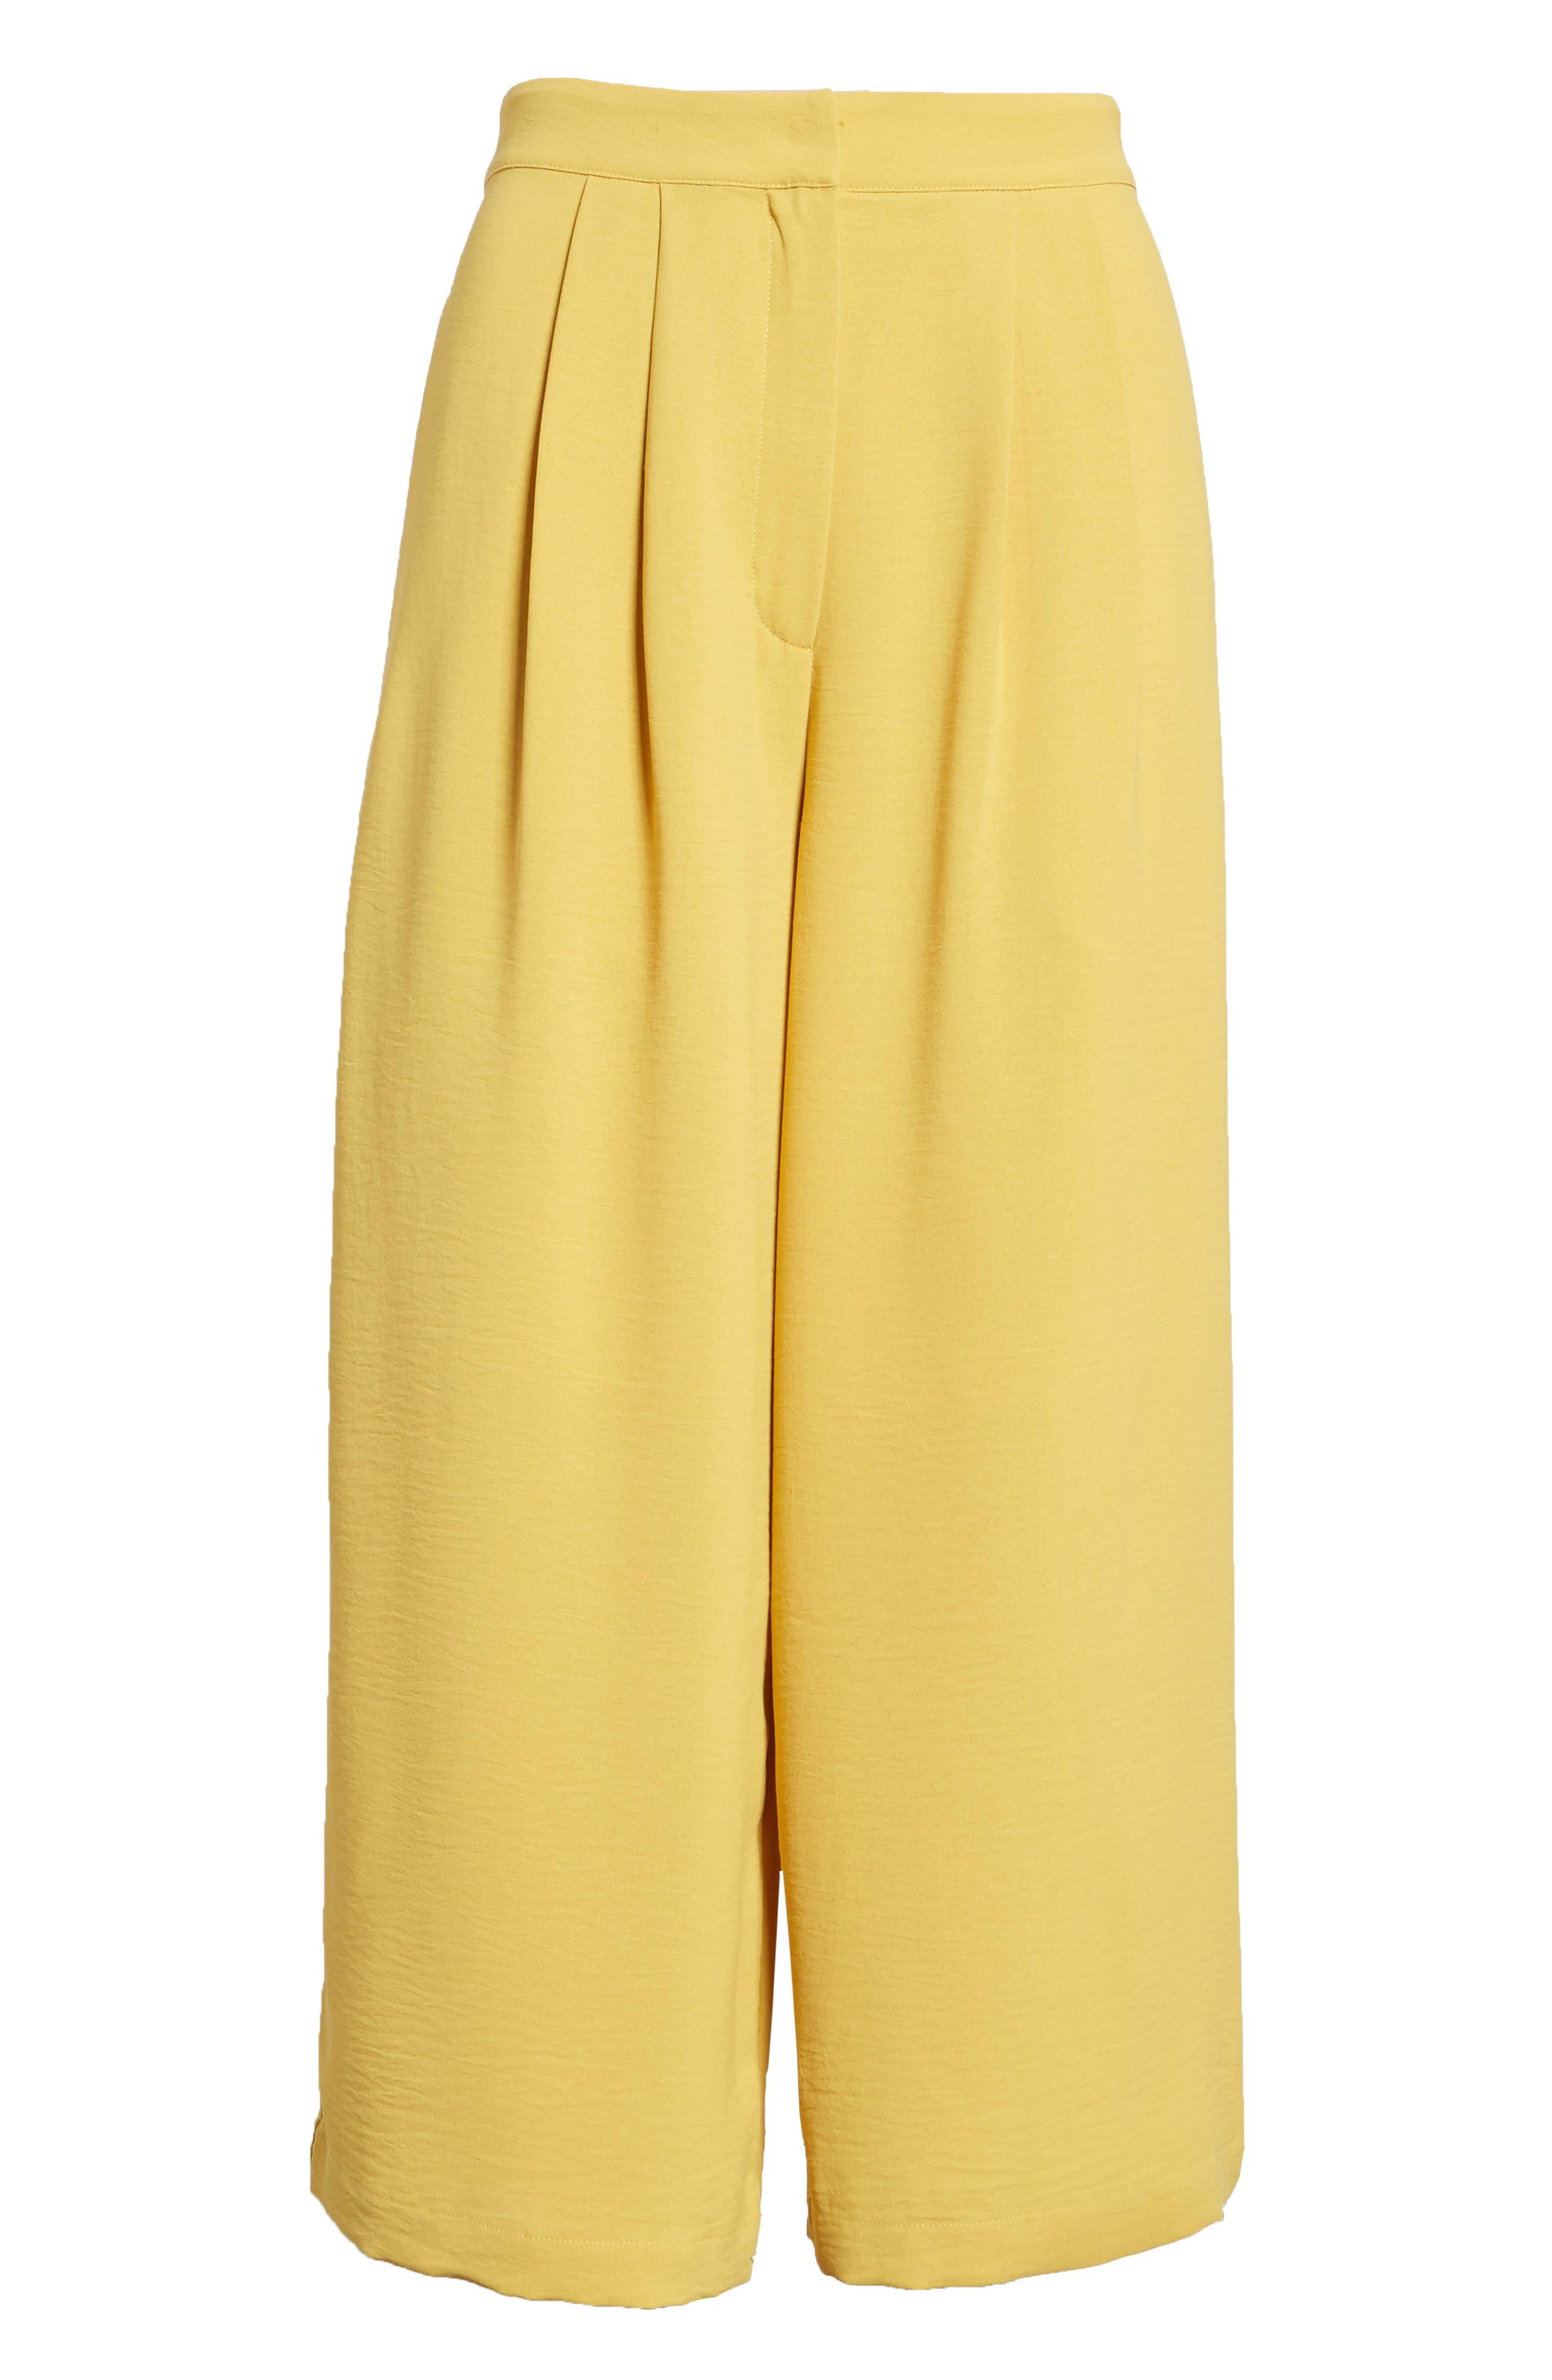 Chriselle x J.O.A. Pleat High Waist Crop Wide Leg Pants,                             Alternate thumbnail 8, color,                             Roman Gold